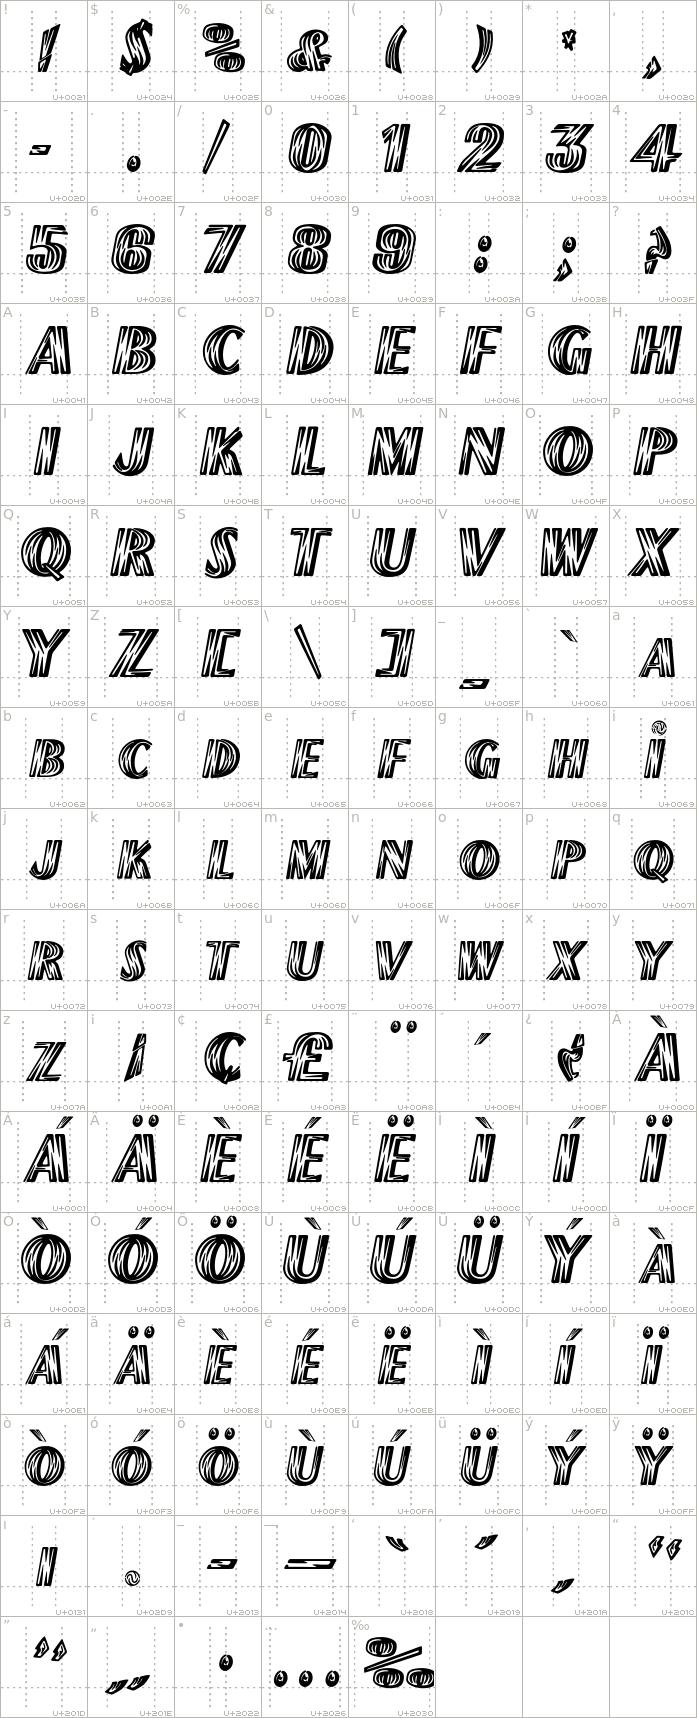 flash.medium.character-map-1